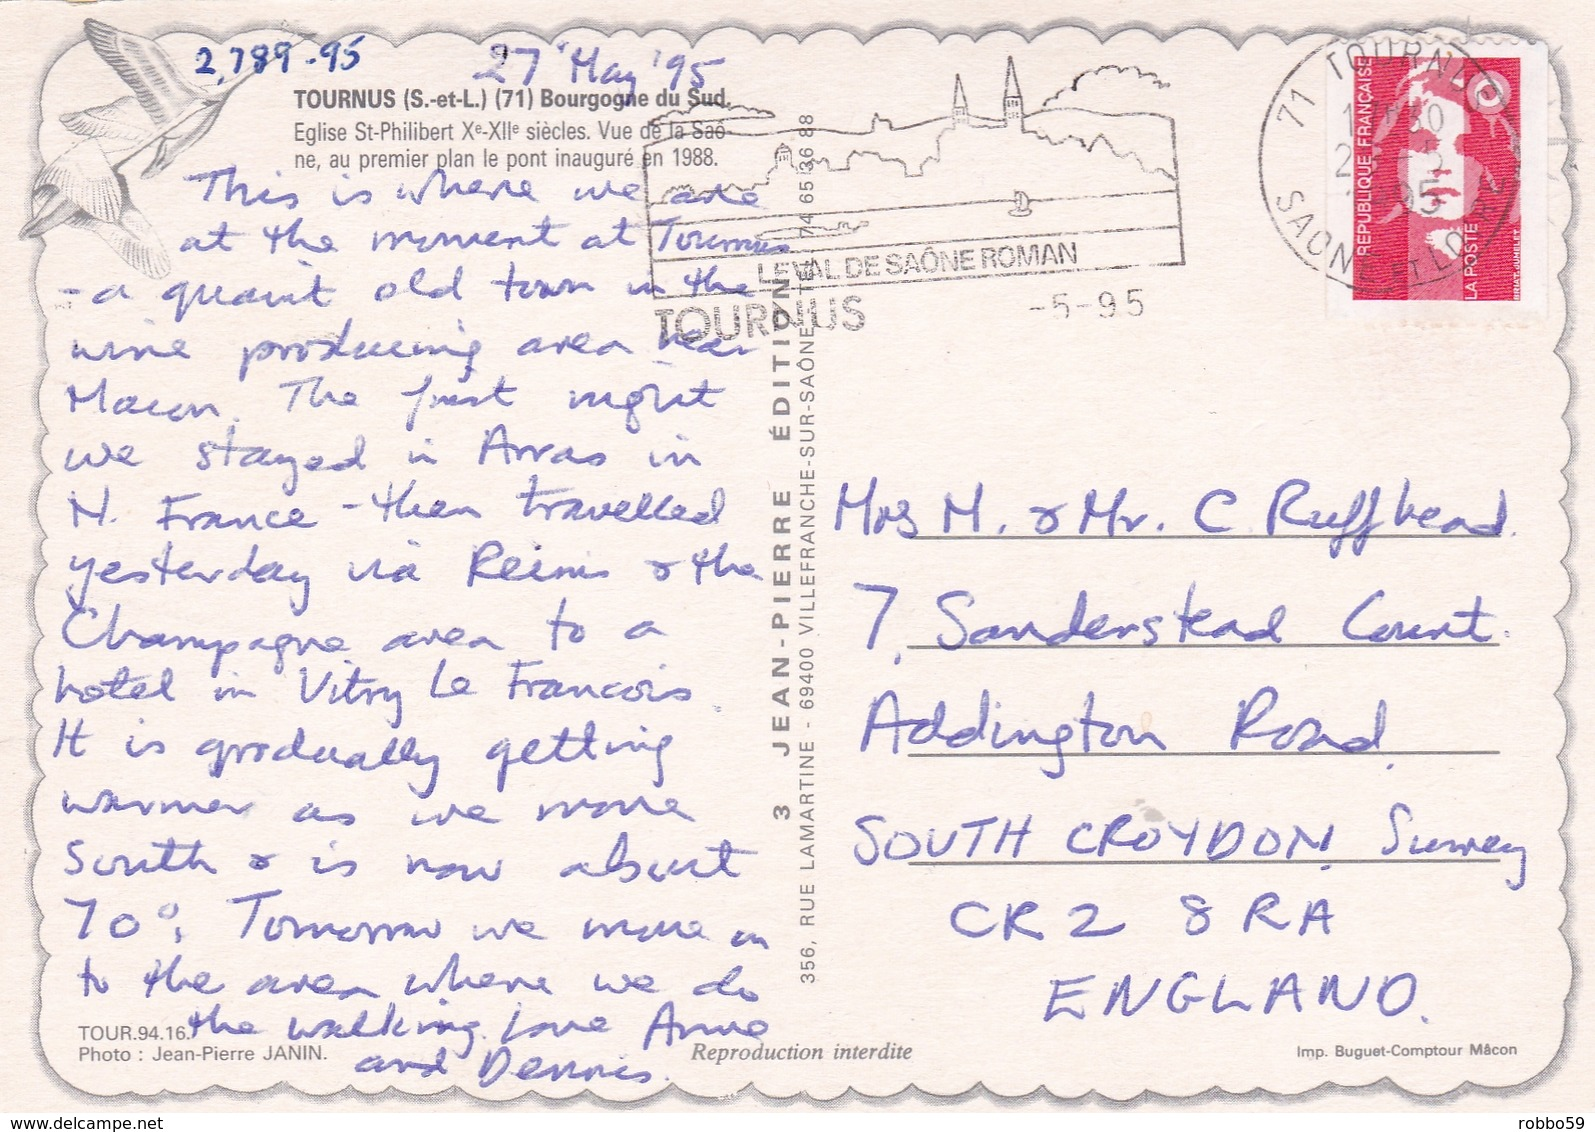 France Tournus With St Philibert Church  Postcard Tournus 1995 Postmark With Slogan Used Good Condition - France